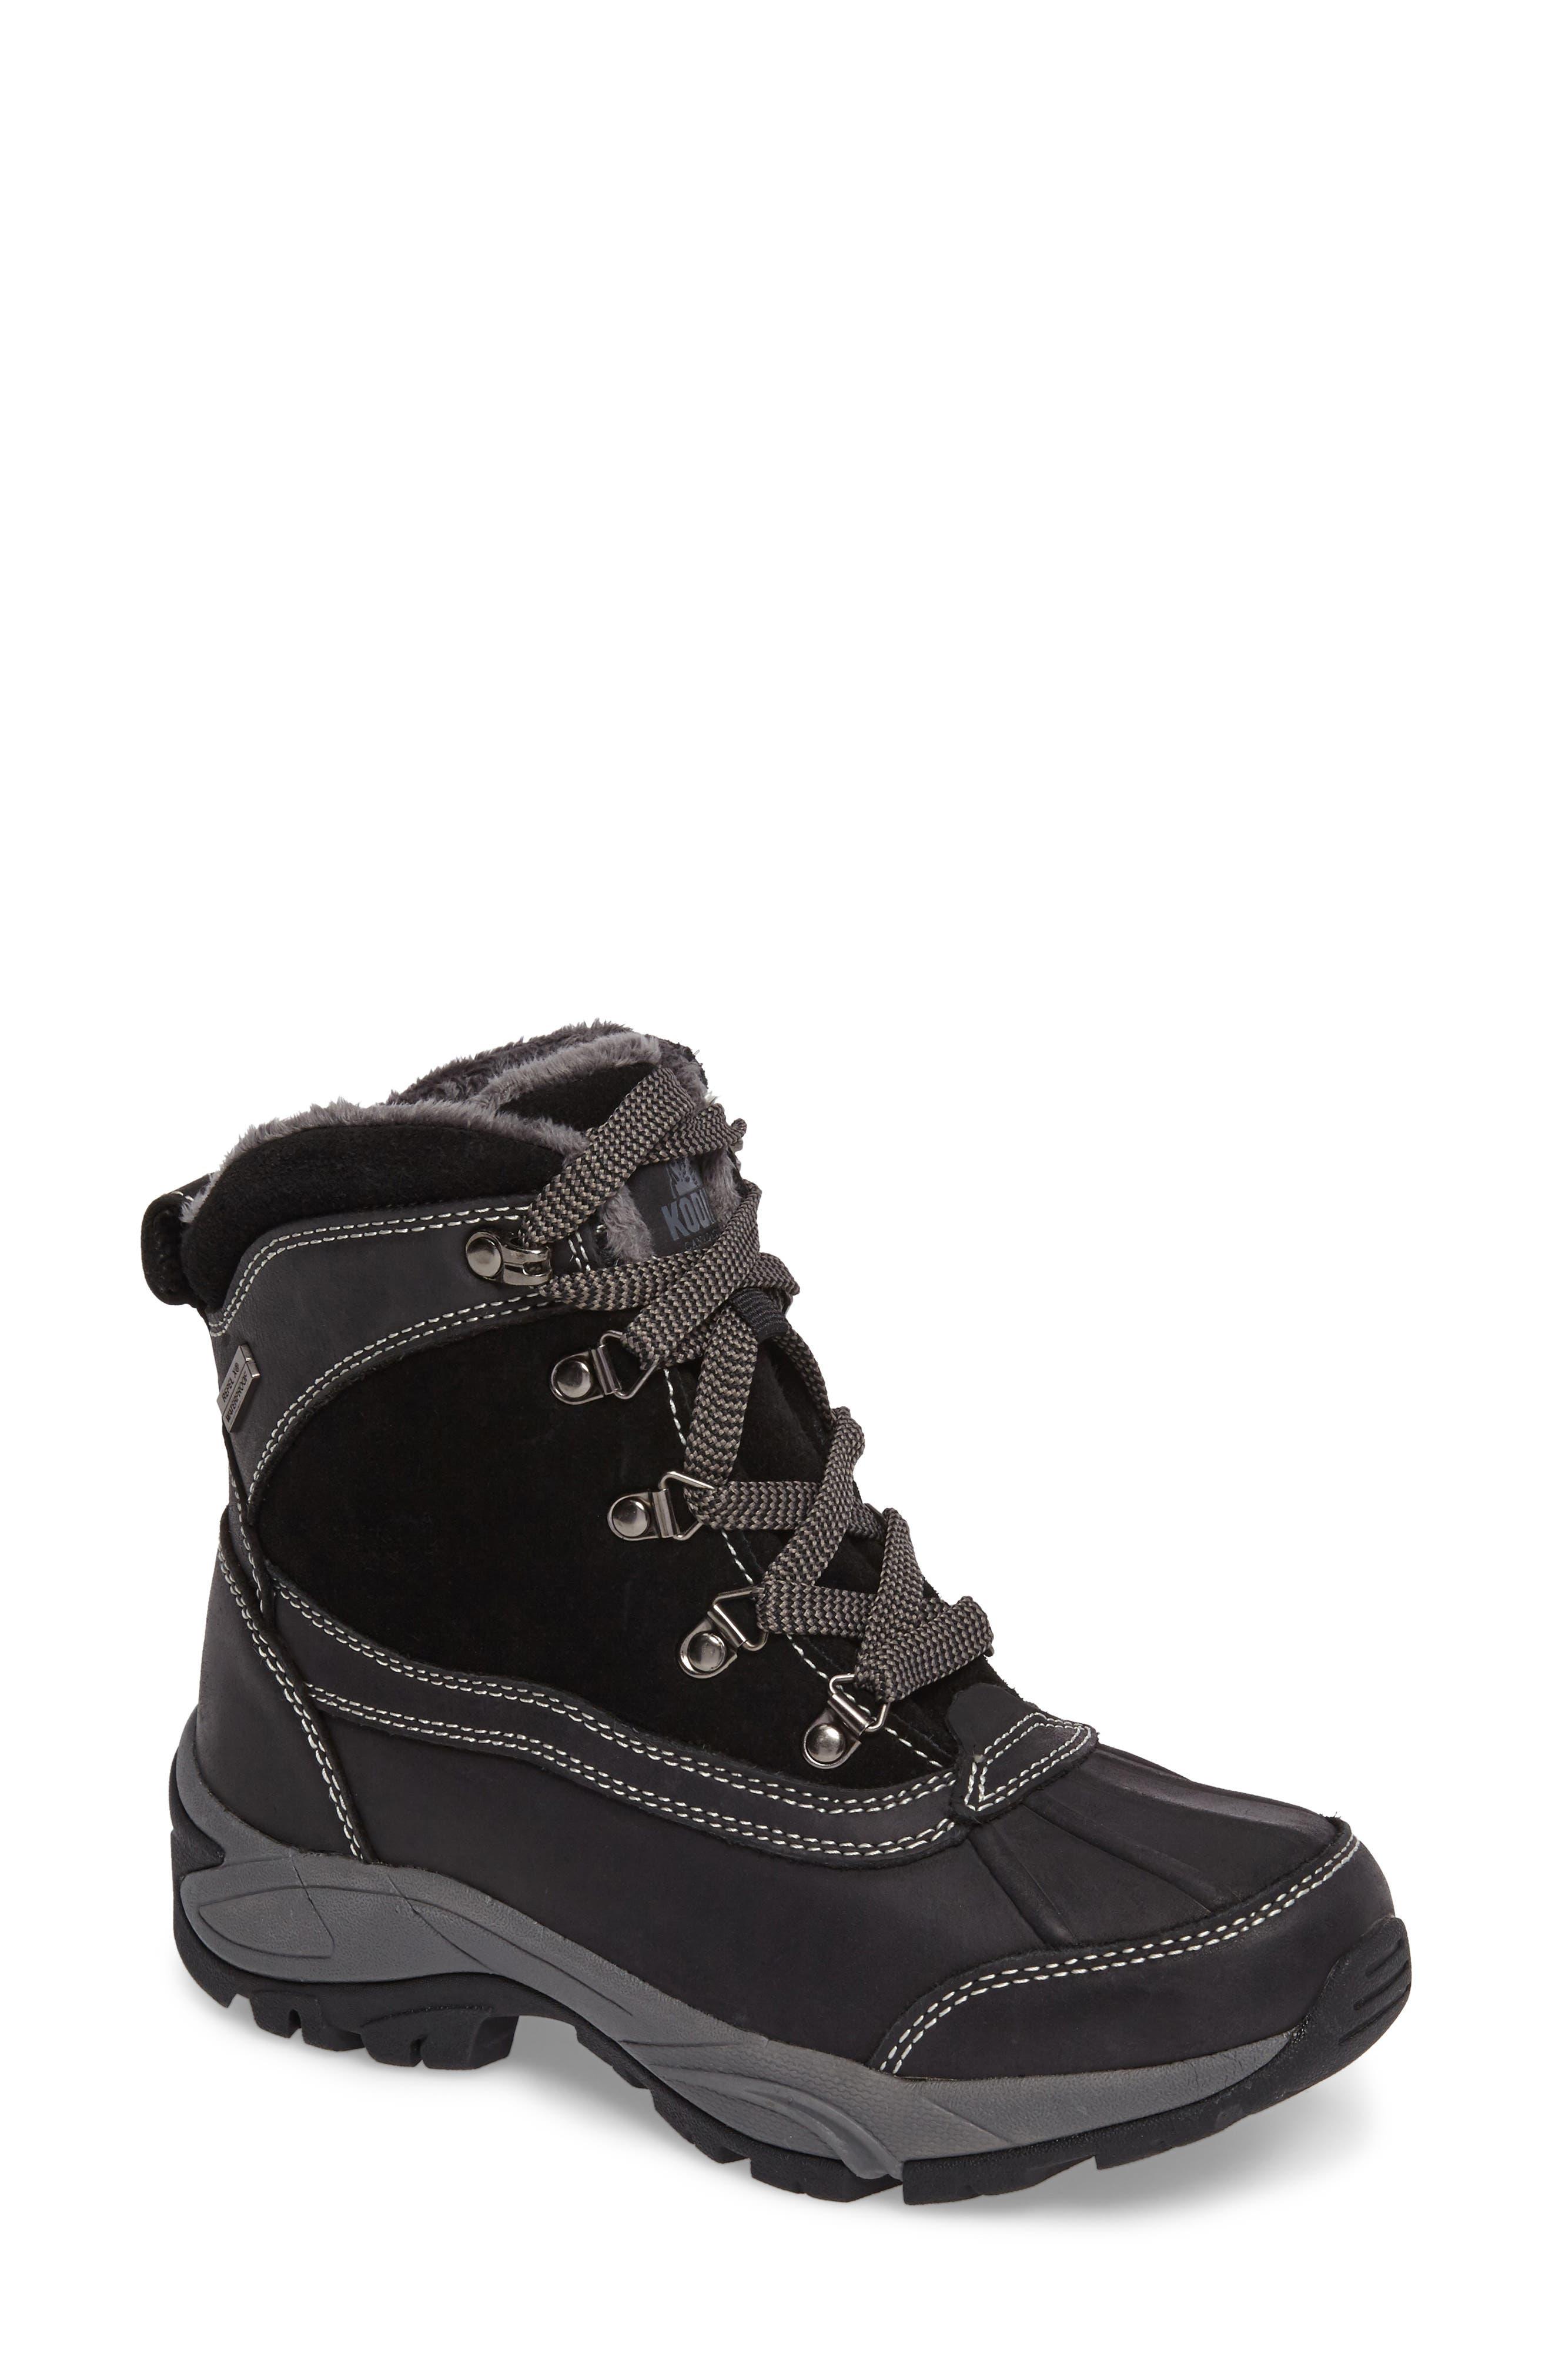 'Renee' Waterproof Insulated Winter Boot,                         Main,                         color, 001